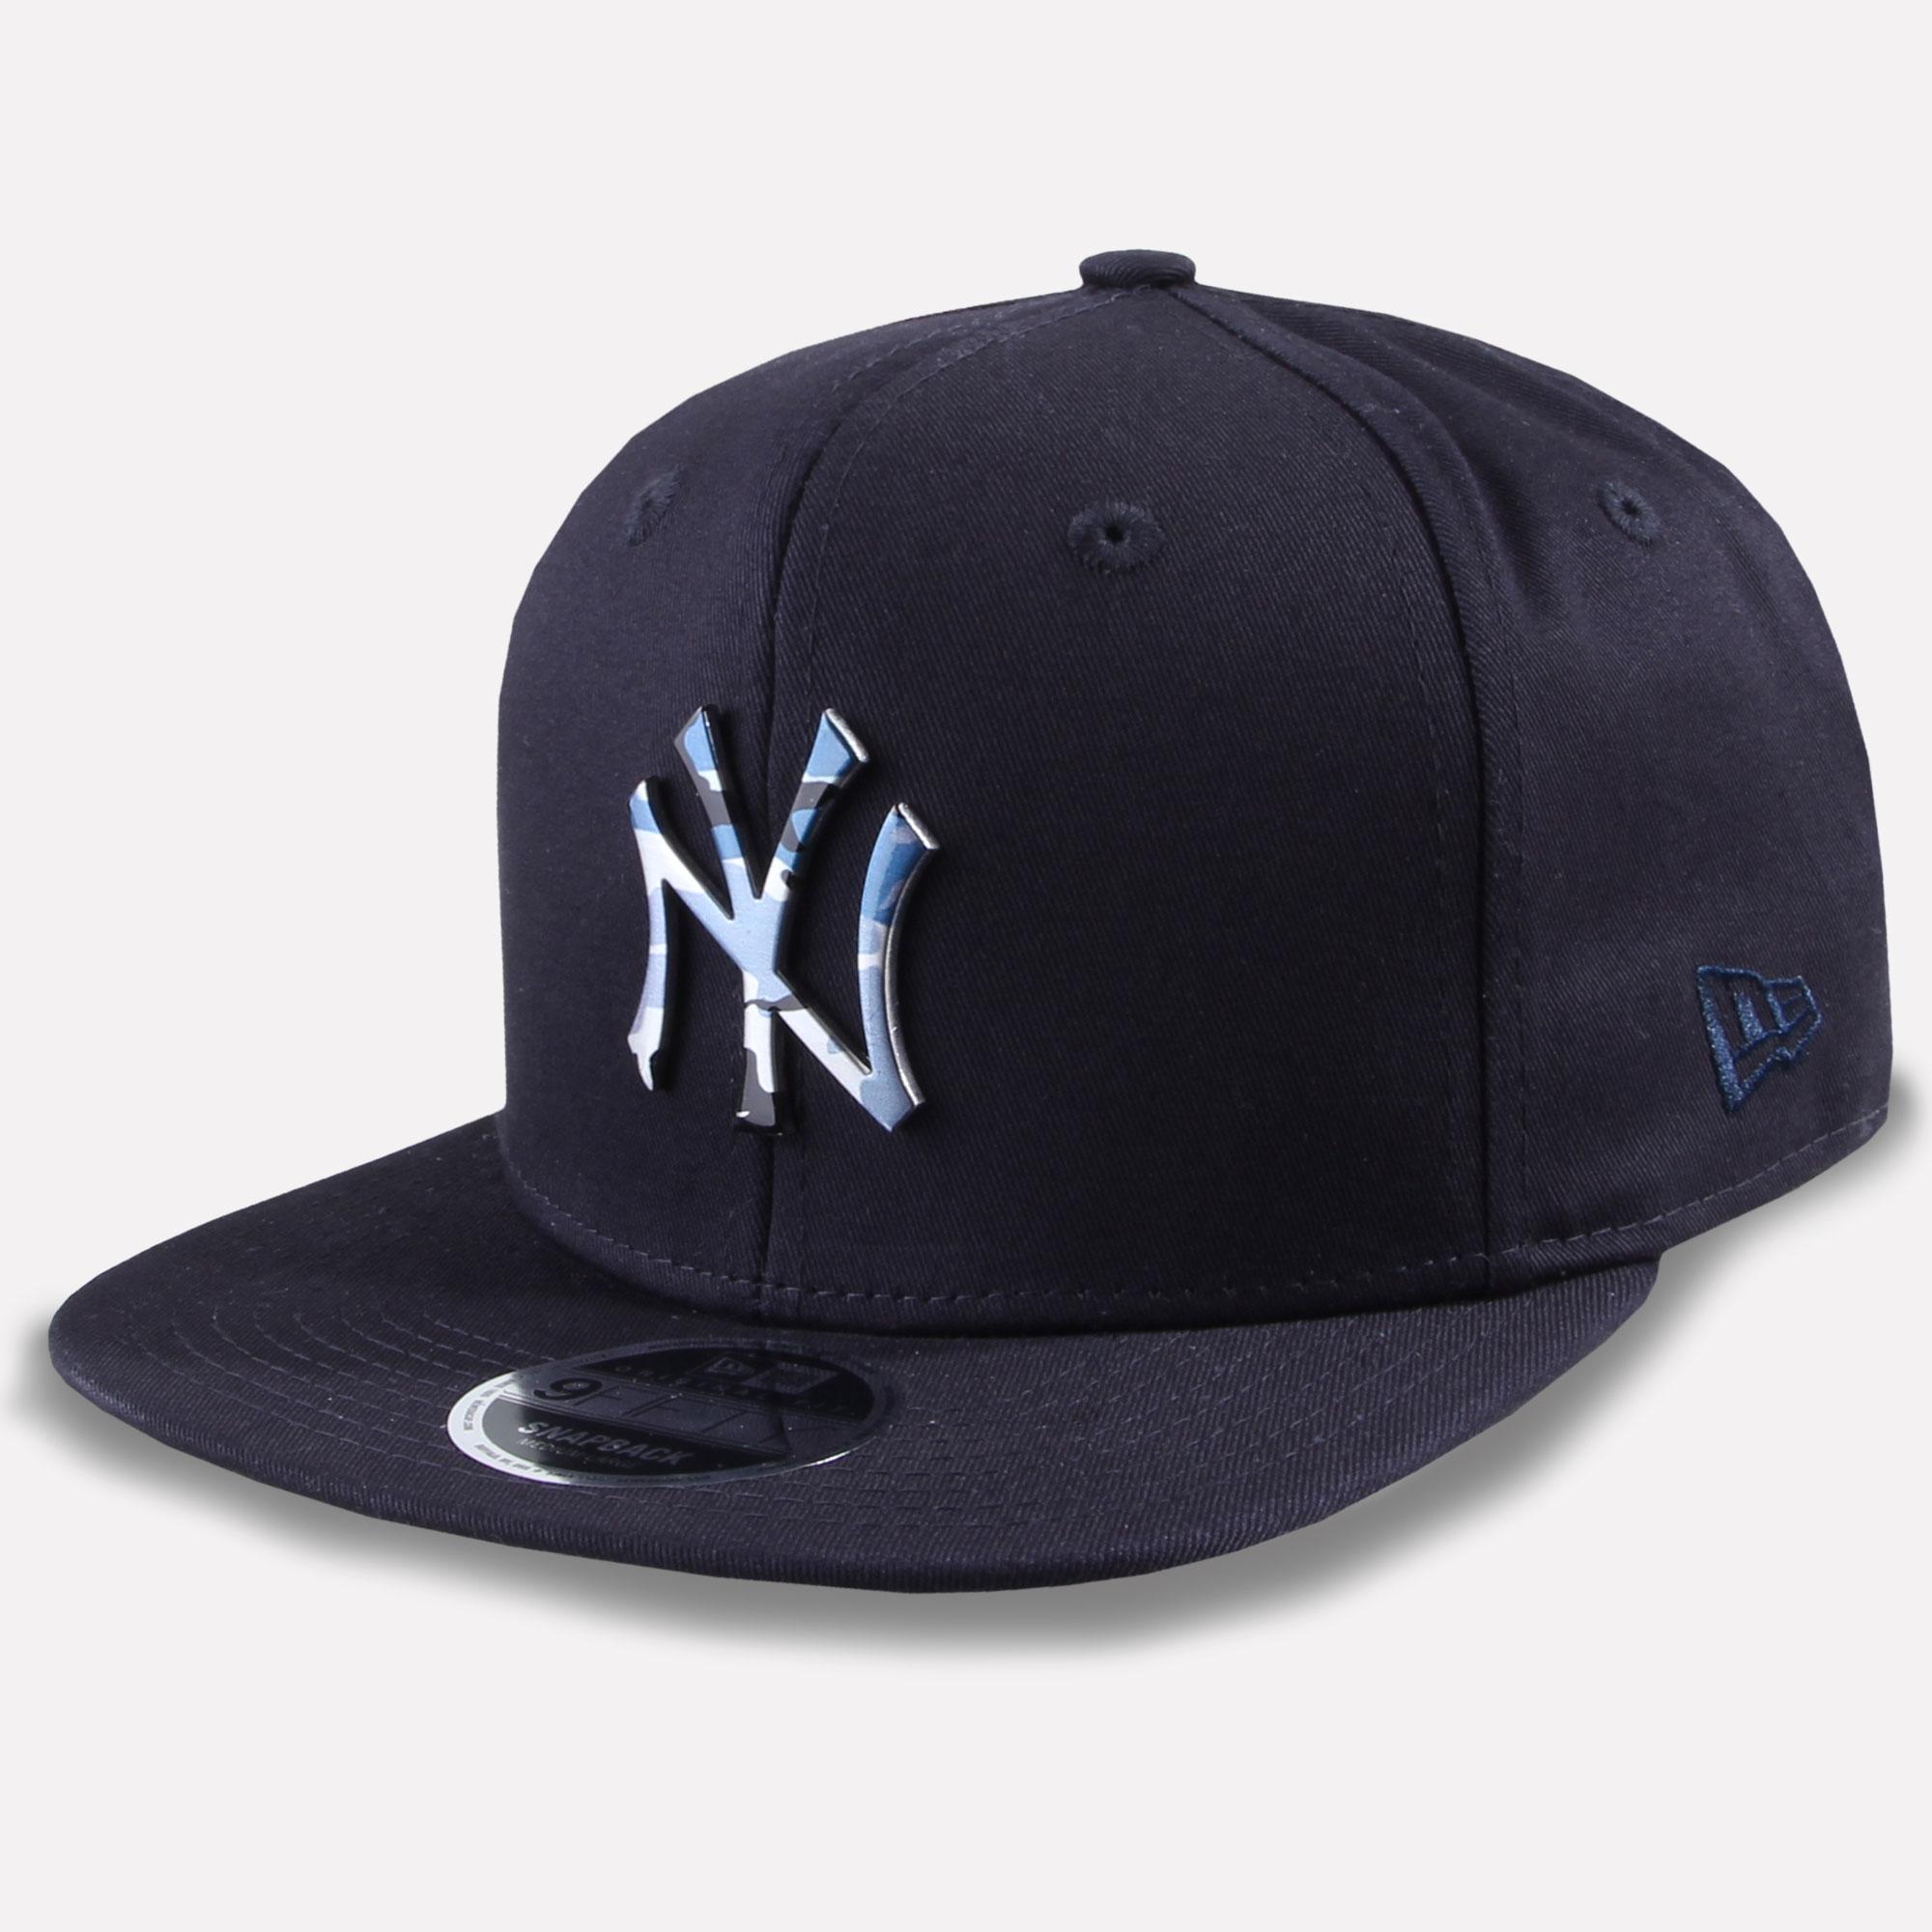 7bb8075404b46 New Era 9Fifty Snapback Cap MLB Team New York Yankees Camo Metal New ...